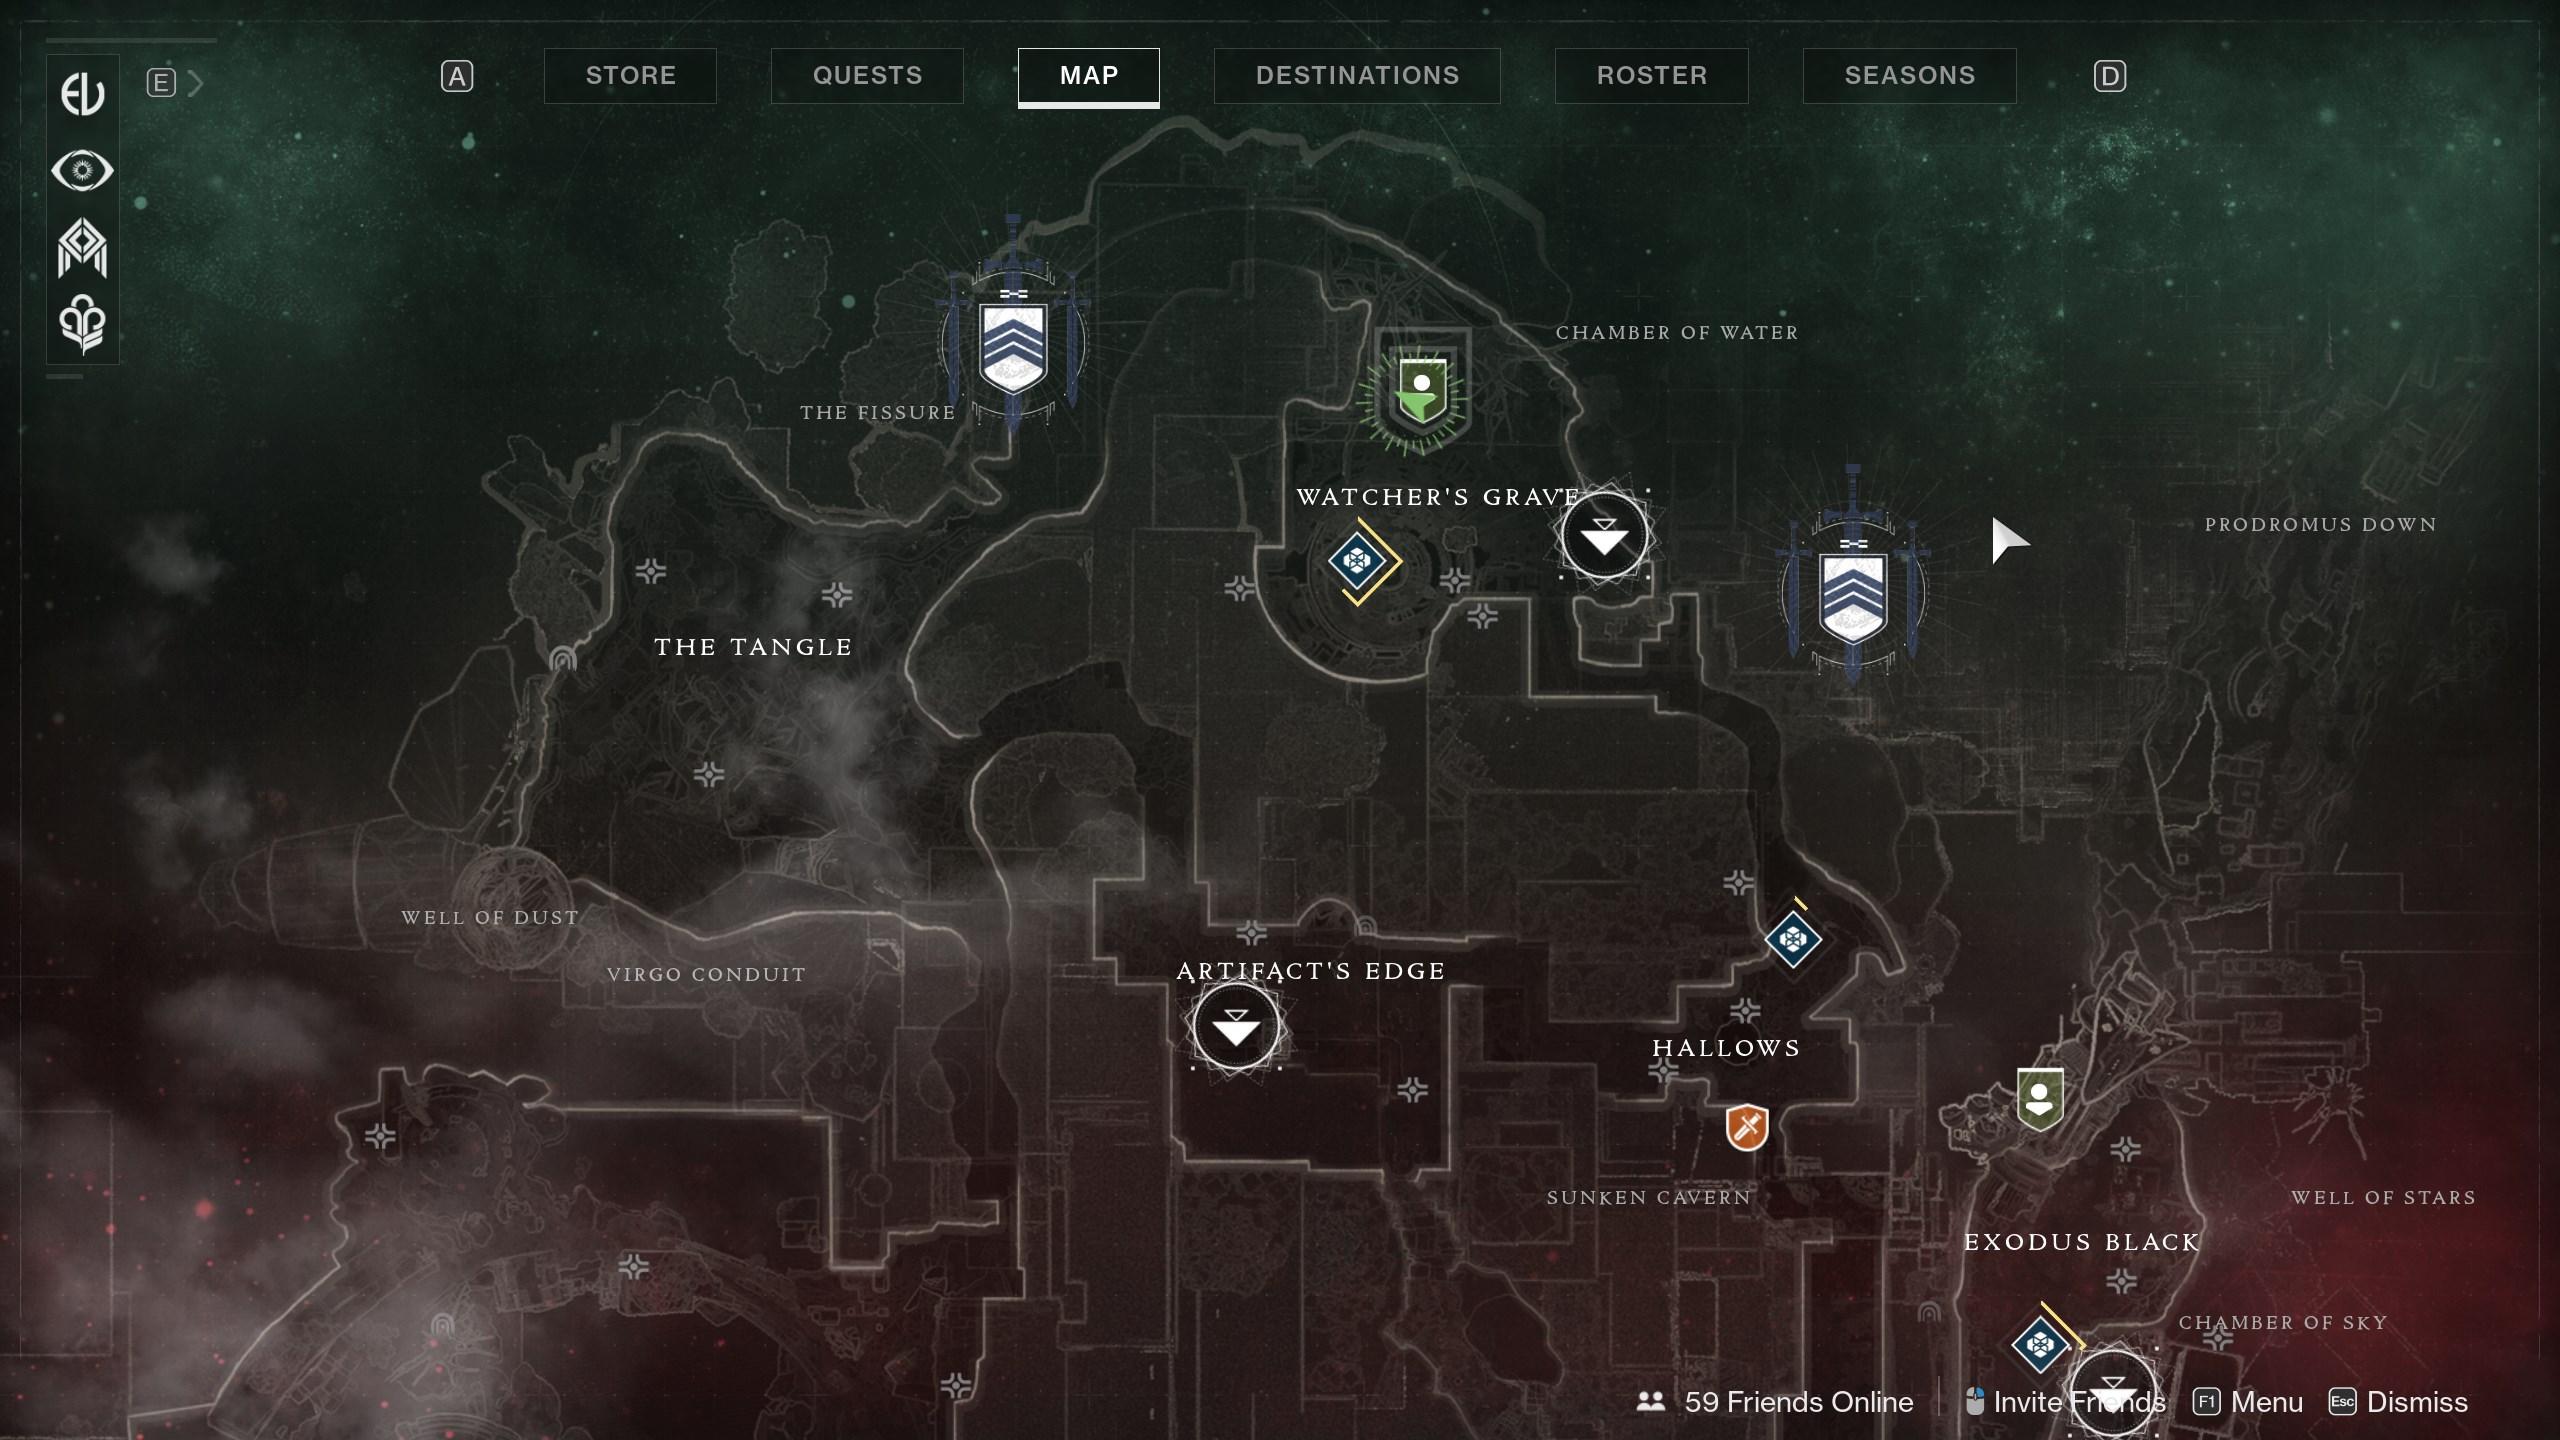 Xur's location - april 24, 2020 - Destiny 2